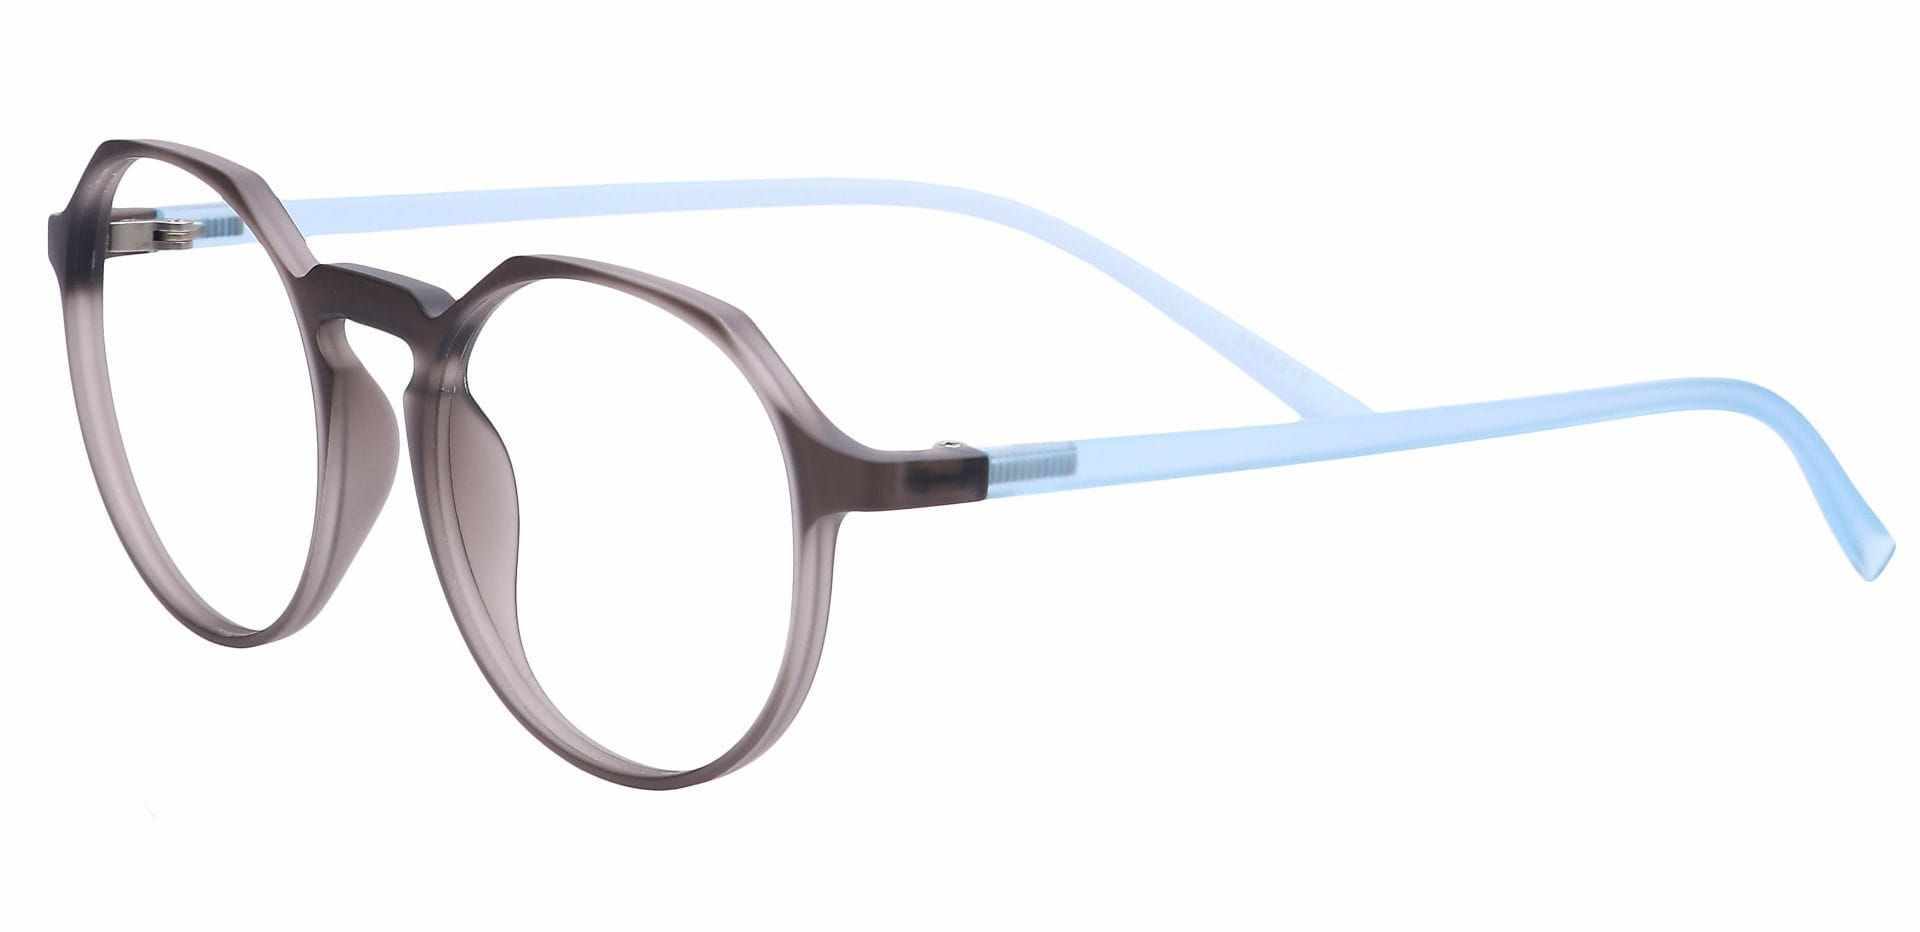 Paragon Oval Prescription Glasses - Blue